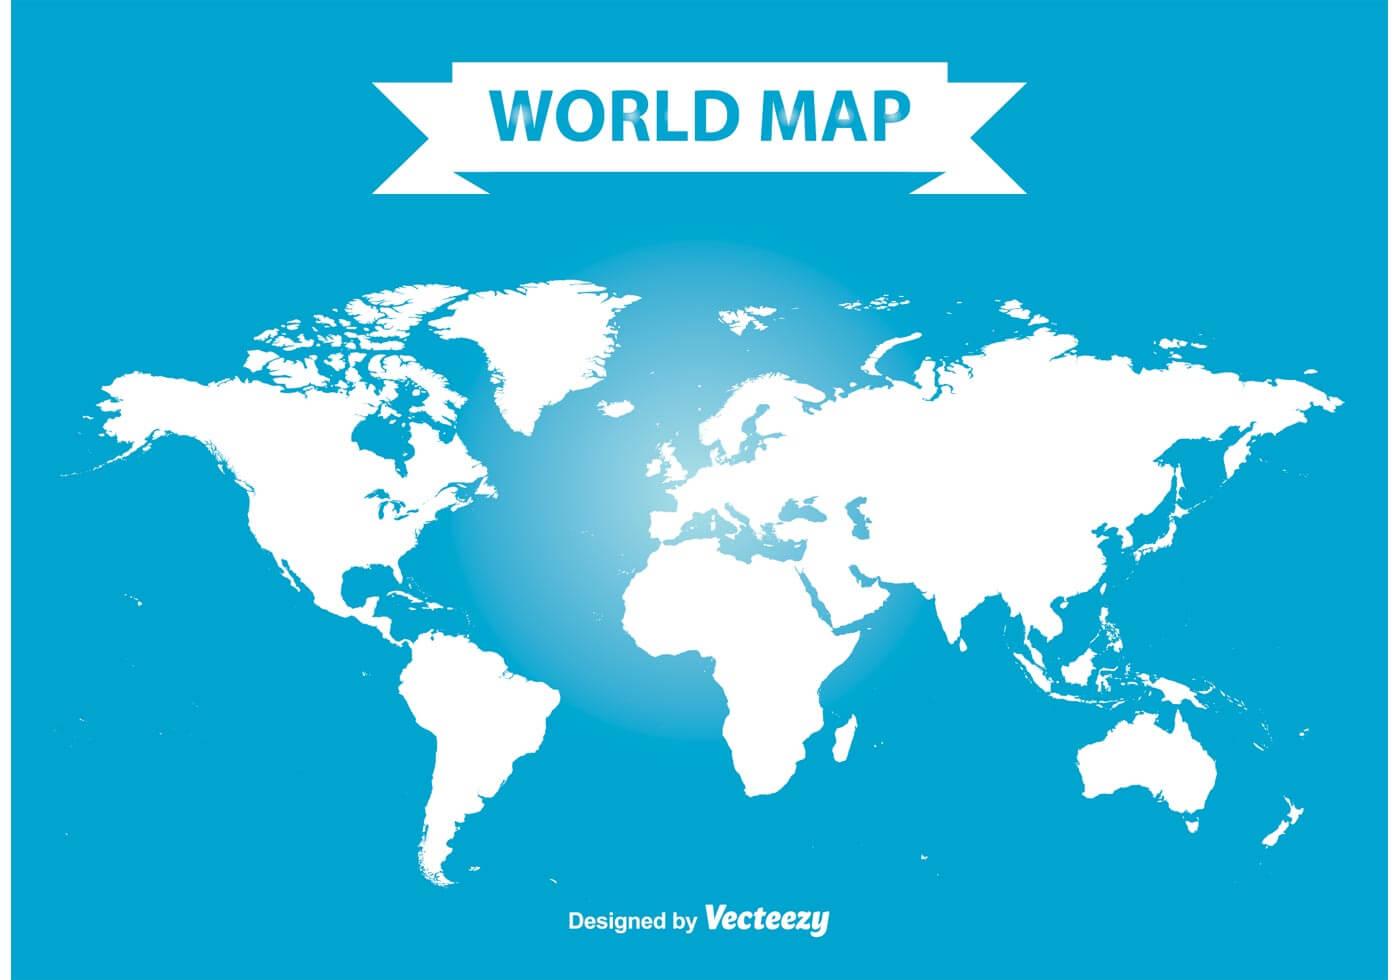 25 Free World Map Vectors and PSDs | Inspirationfeed